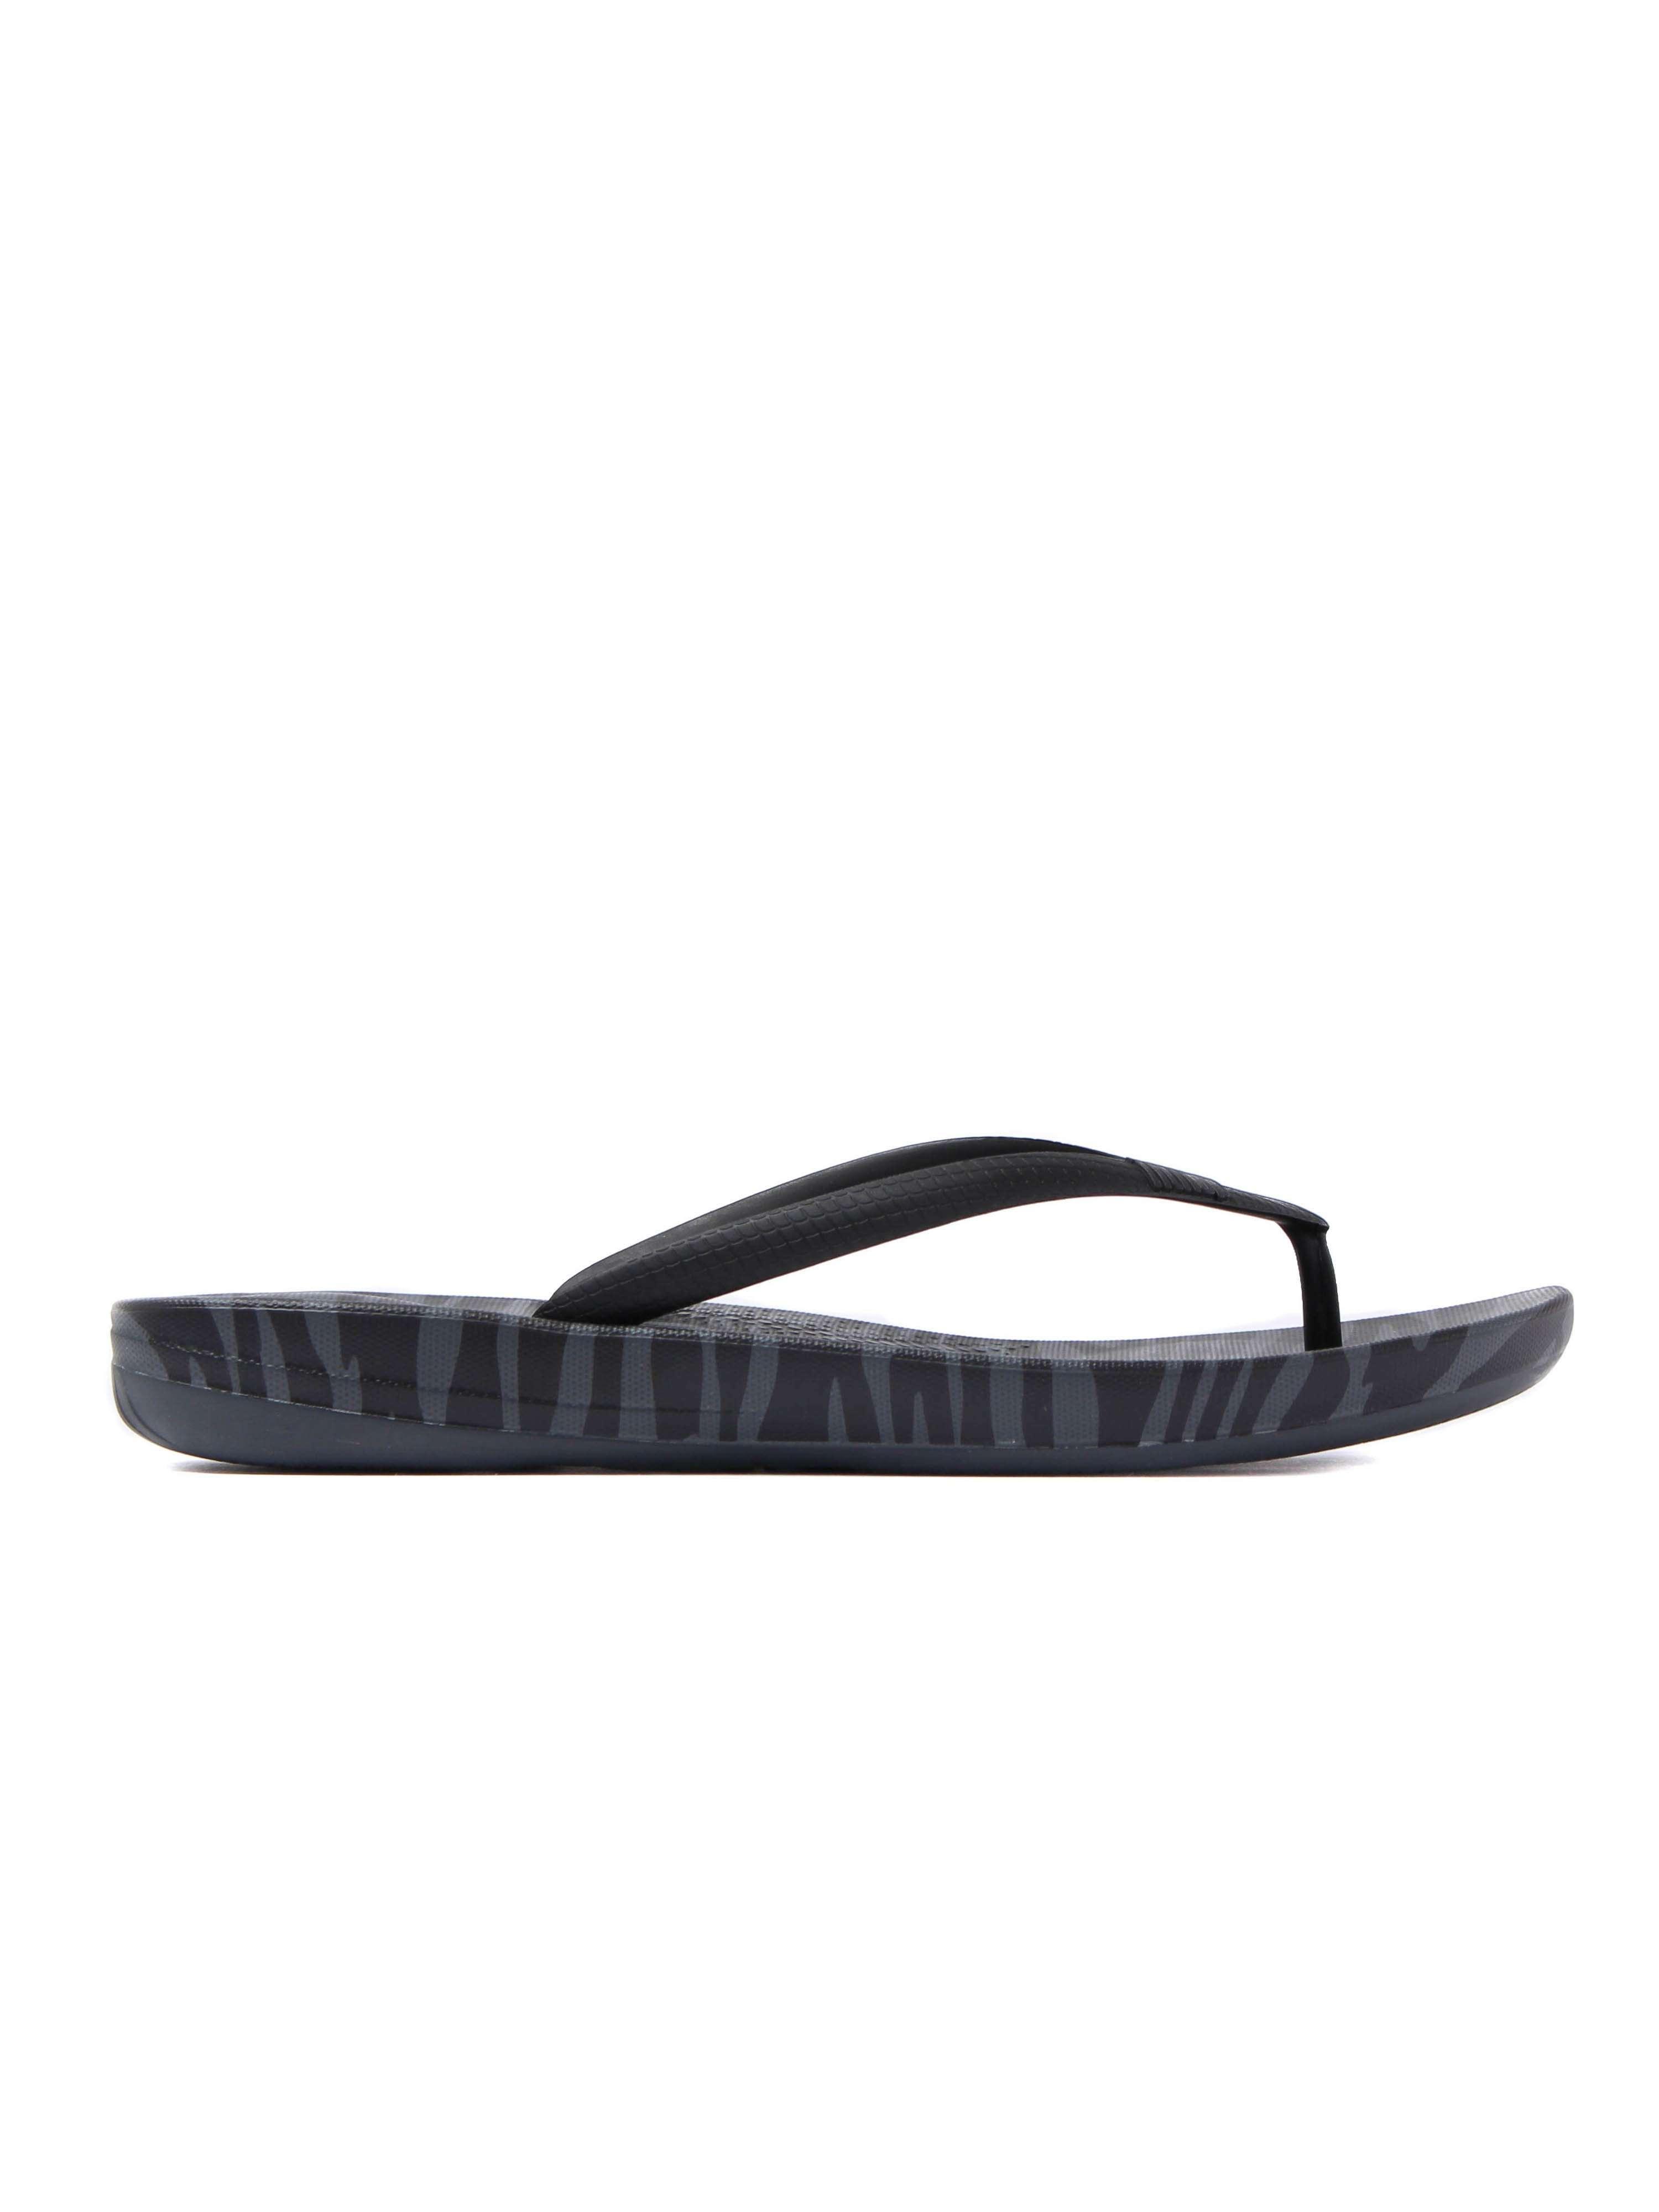 FitFlop Women's IQushion Ergonomic Flip Flops - Charcoal Tiger Print